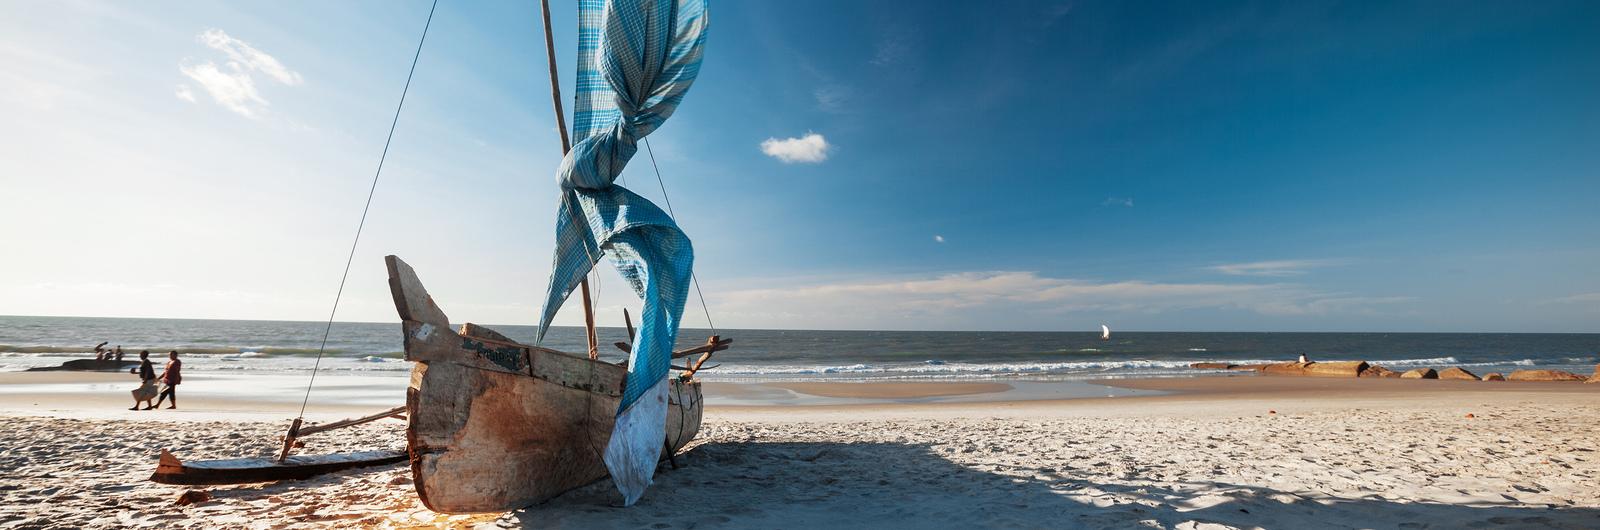 city header mosambique sailboat